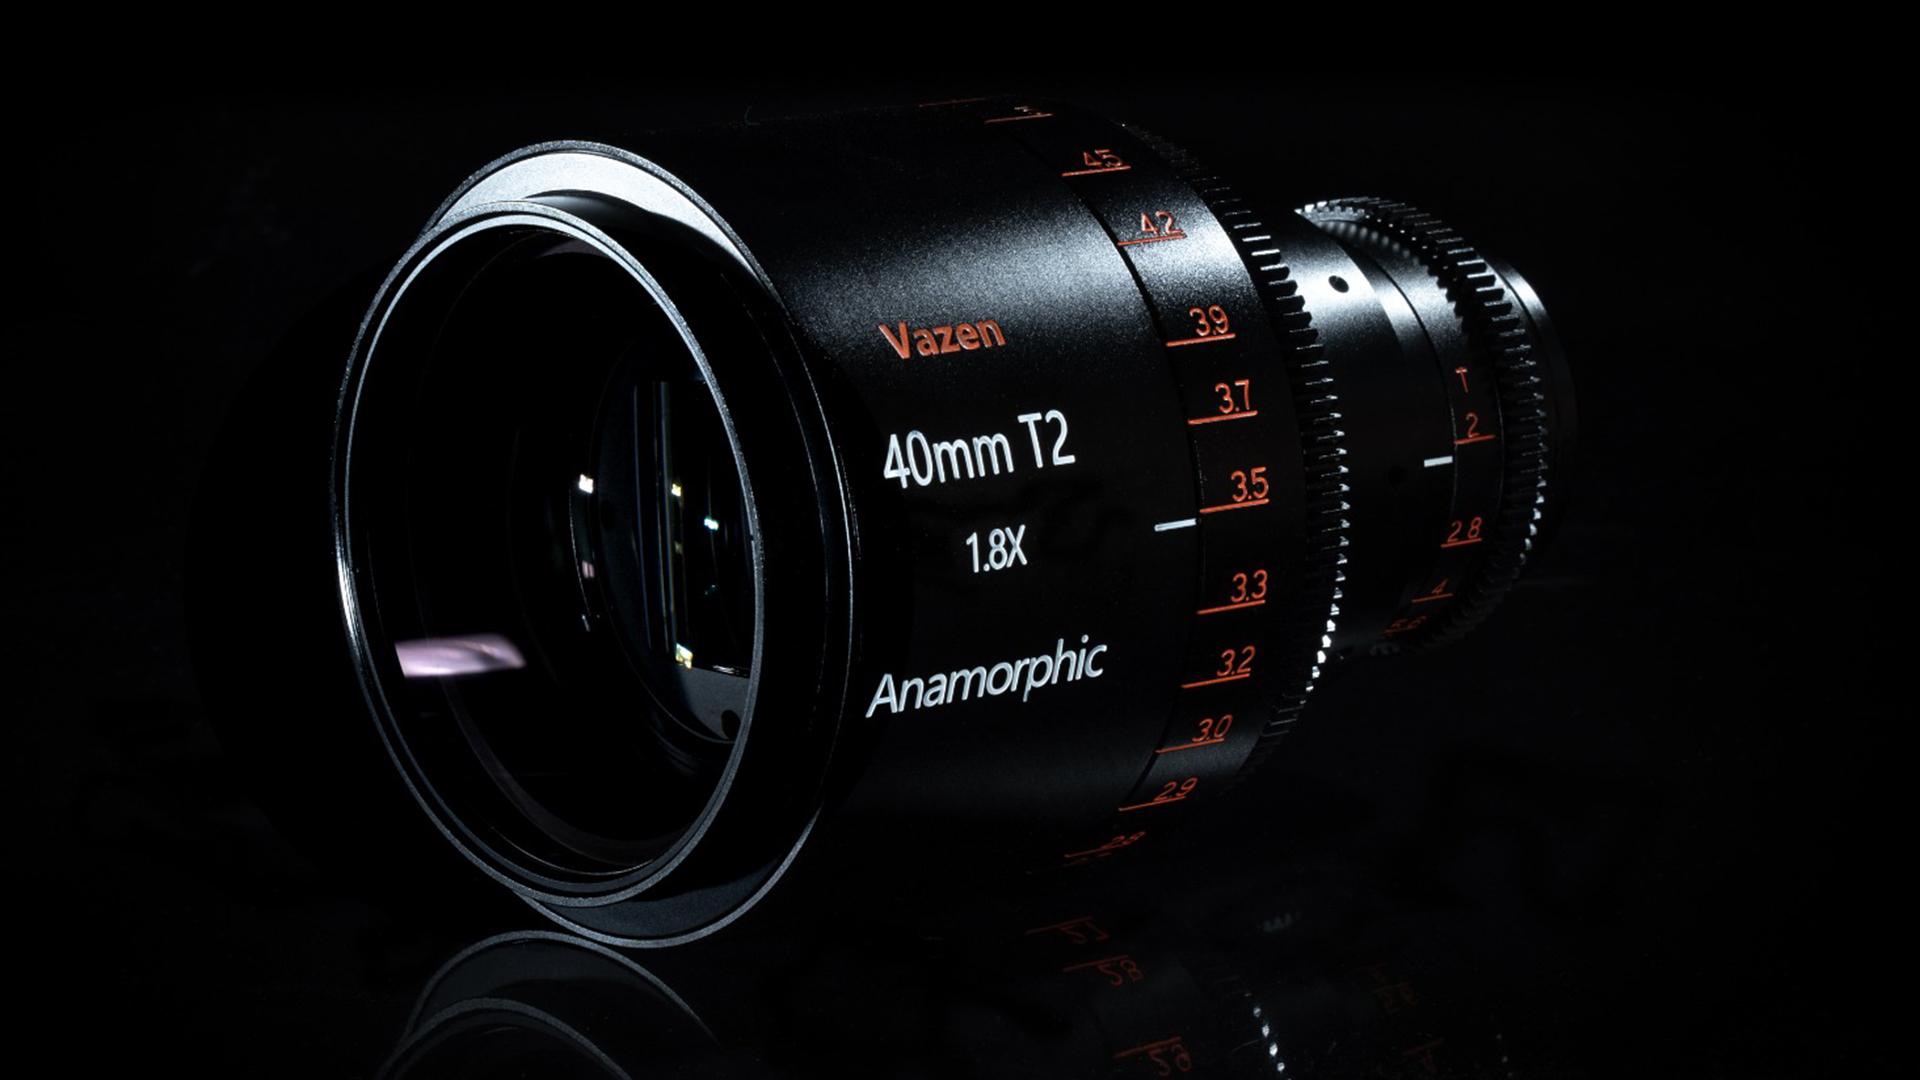 Vazen 1.8x Anamorphic – 3 New Lenses for Micro Four Thirds